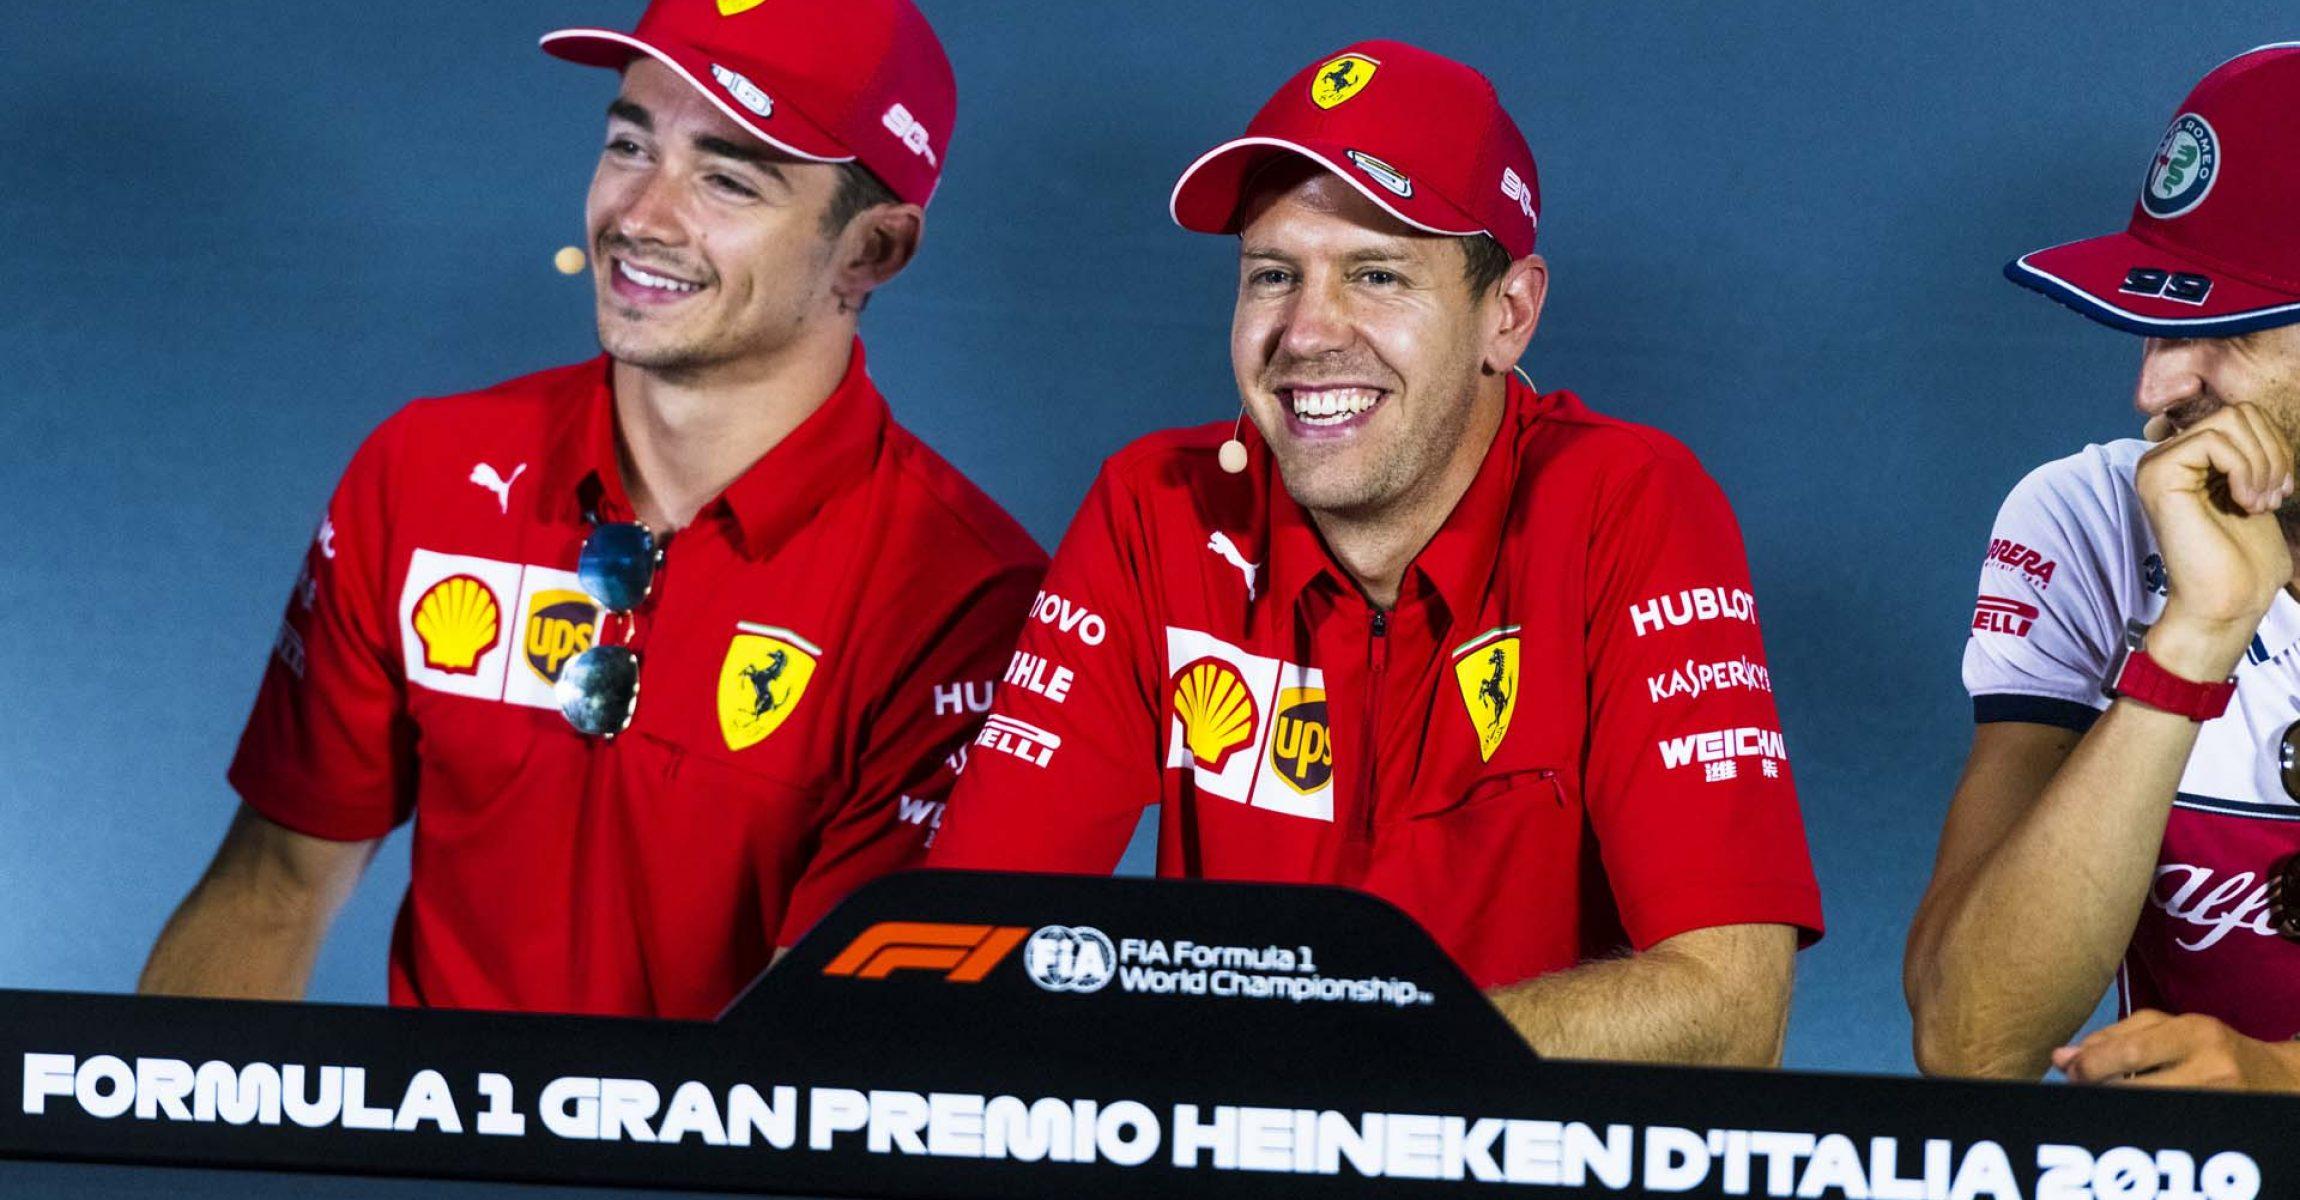 Charles Leclerc, Sebastian Vettel, Antonio Giovinazzi, Ferrari, Alfa Romeo, press conference, Monza